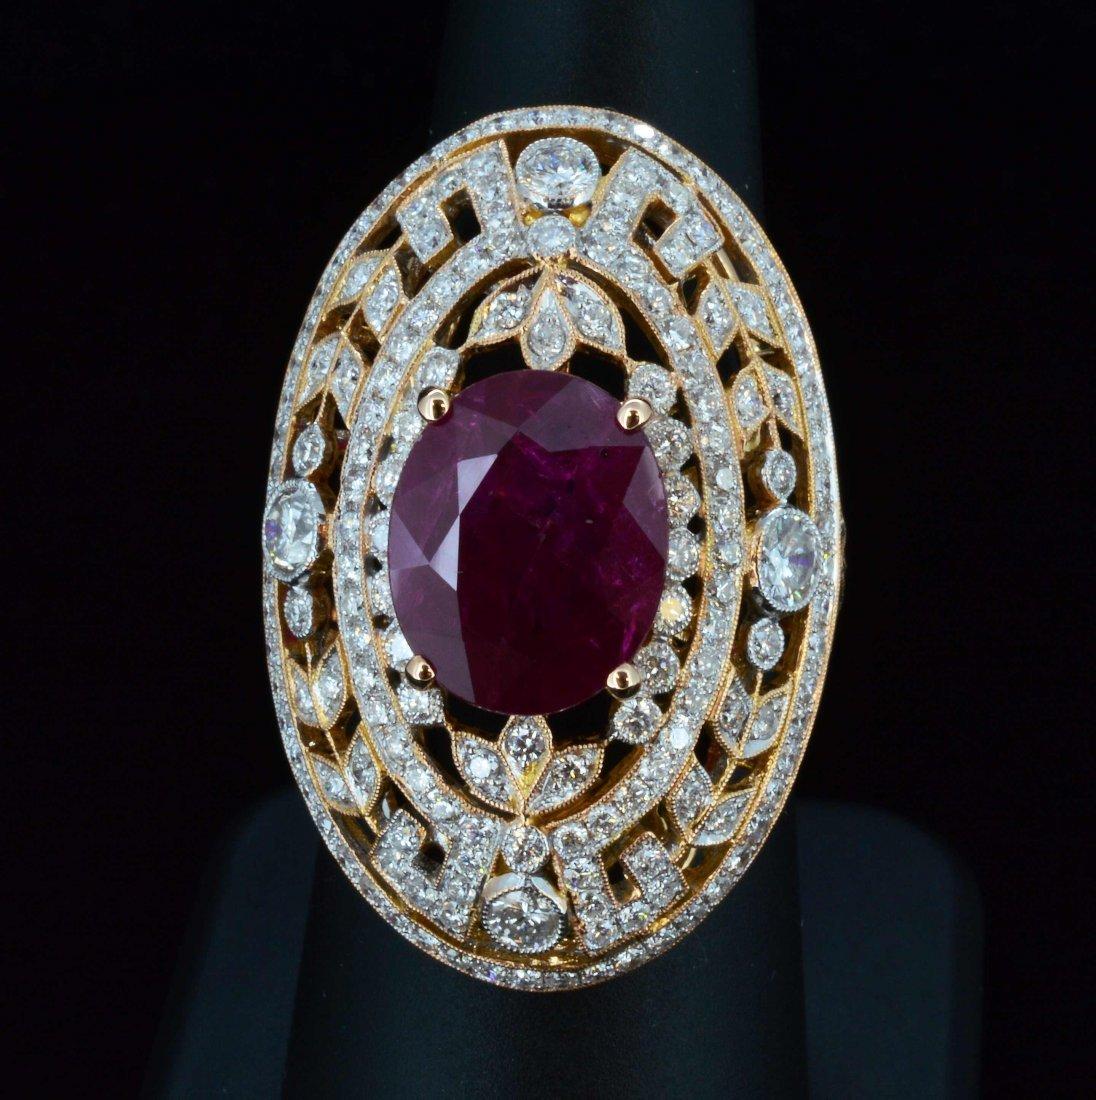 18K Gold, 4.07CT Ruby & 2.51CT Diamond Ring